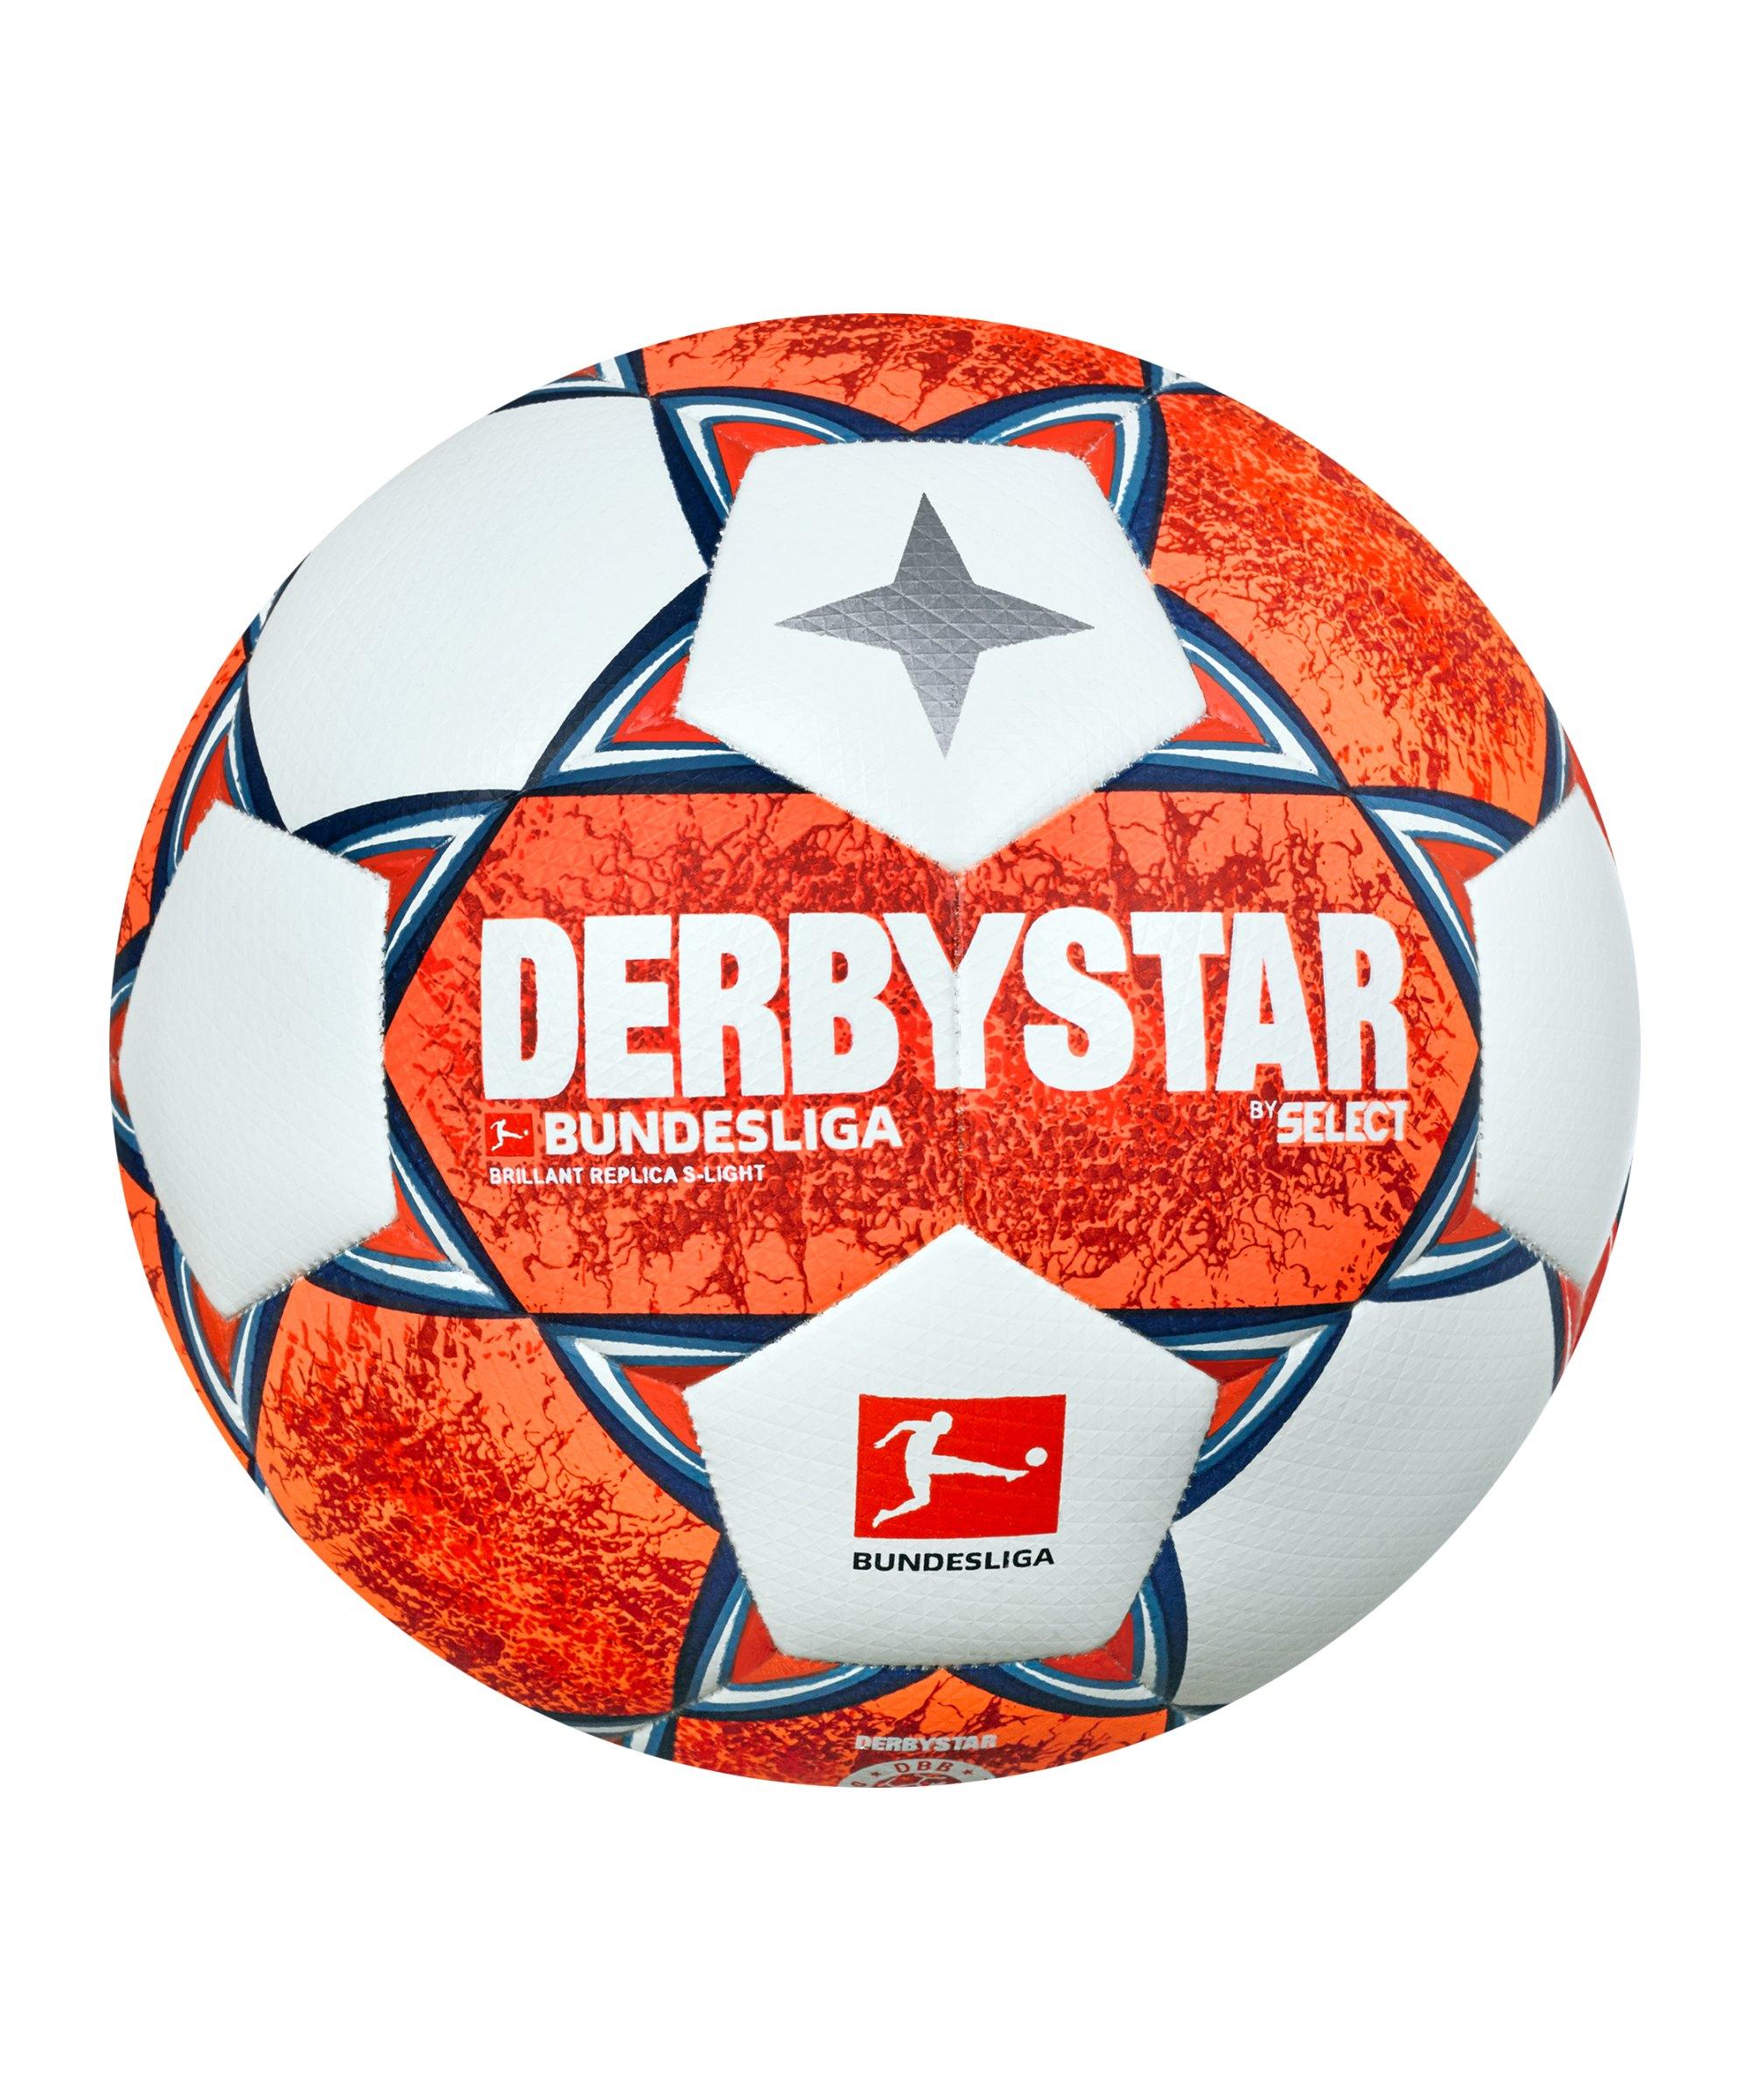 Derbystar Bundesliga Brillant Replica S-Light v21 Trainingsball 290 Gr. 2021/2022 Orange Blau F021 - orange